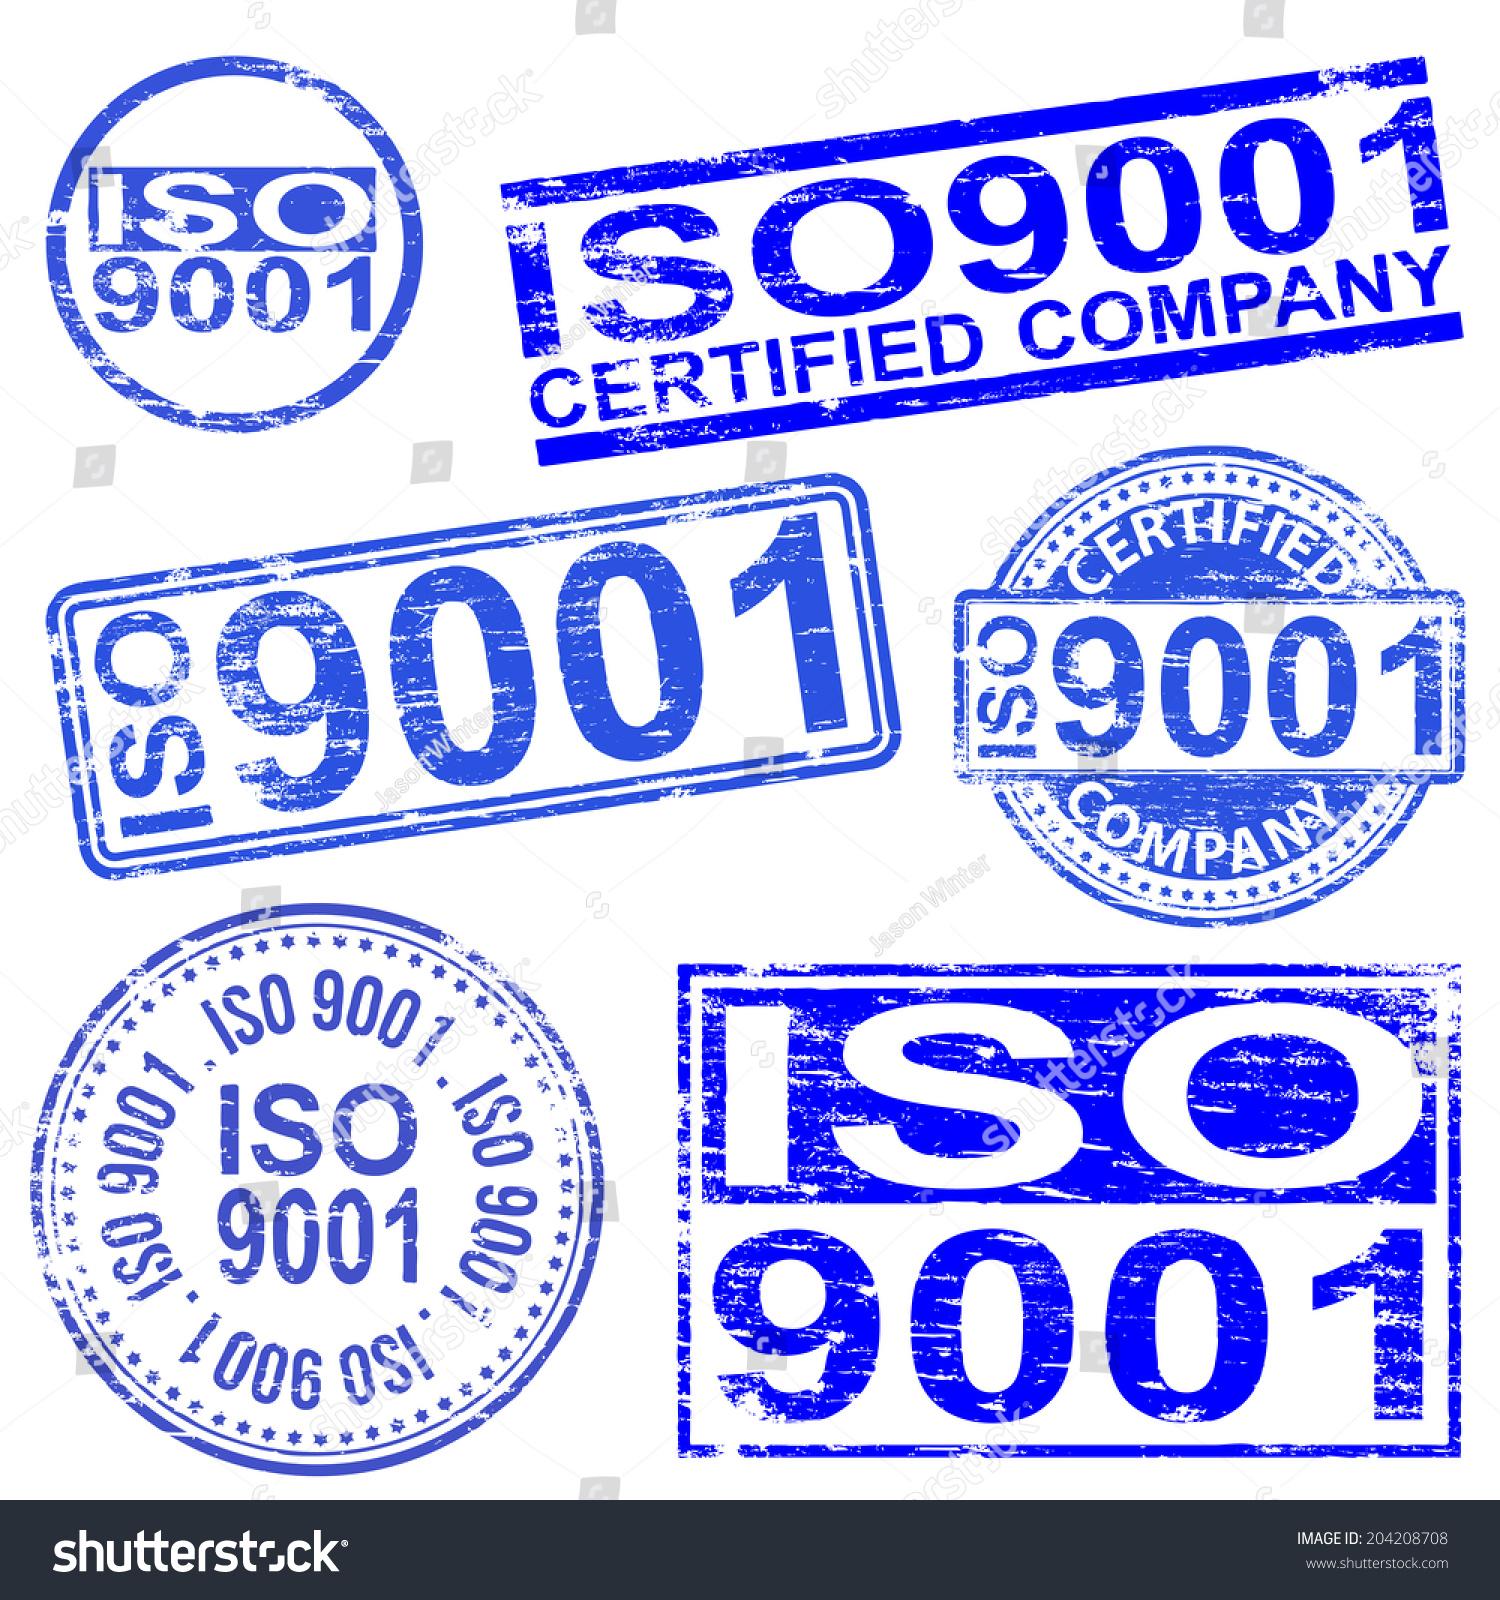 Iso 9001 Rubber Stamp Symbols Stock Illustration 204208708